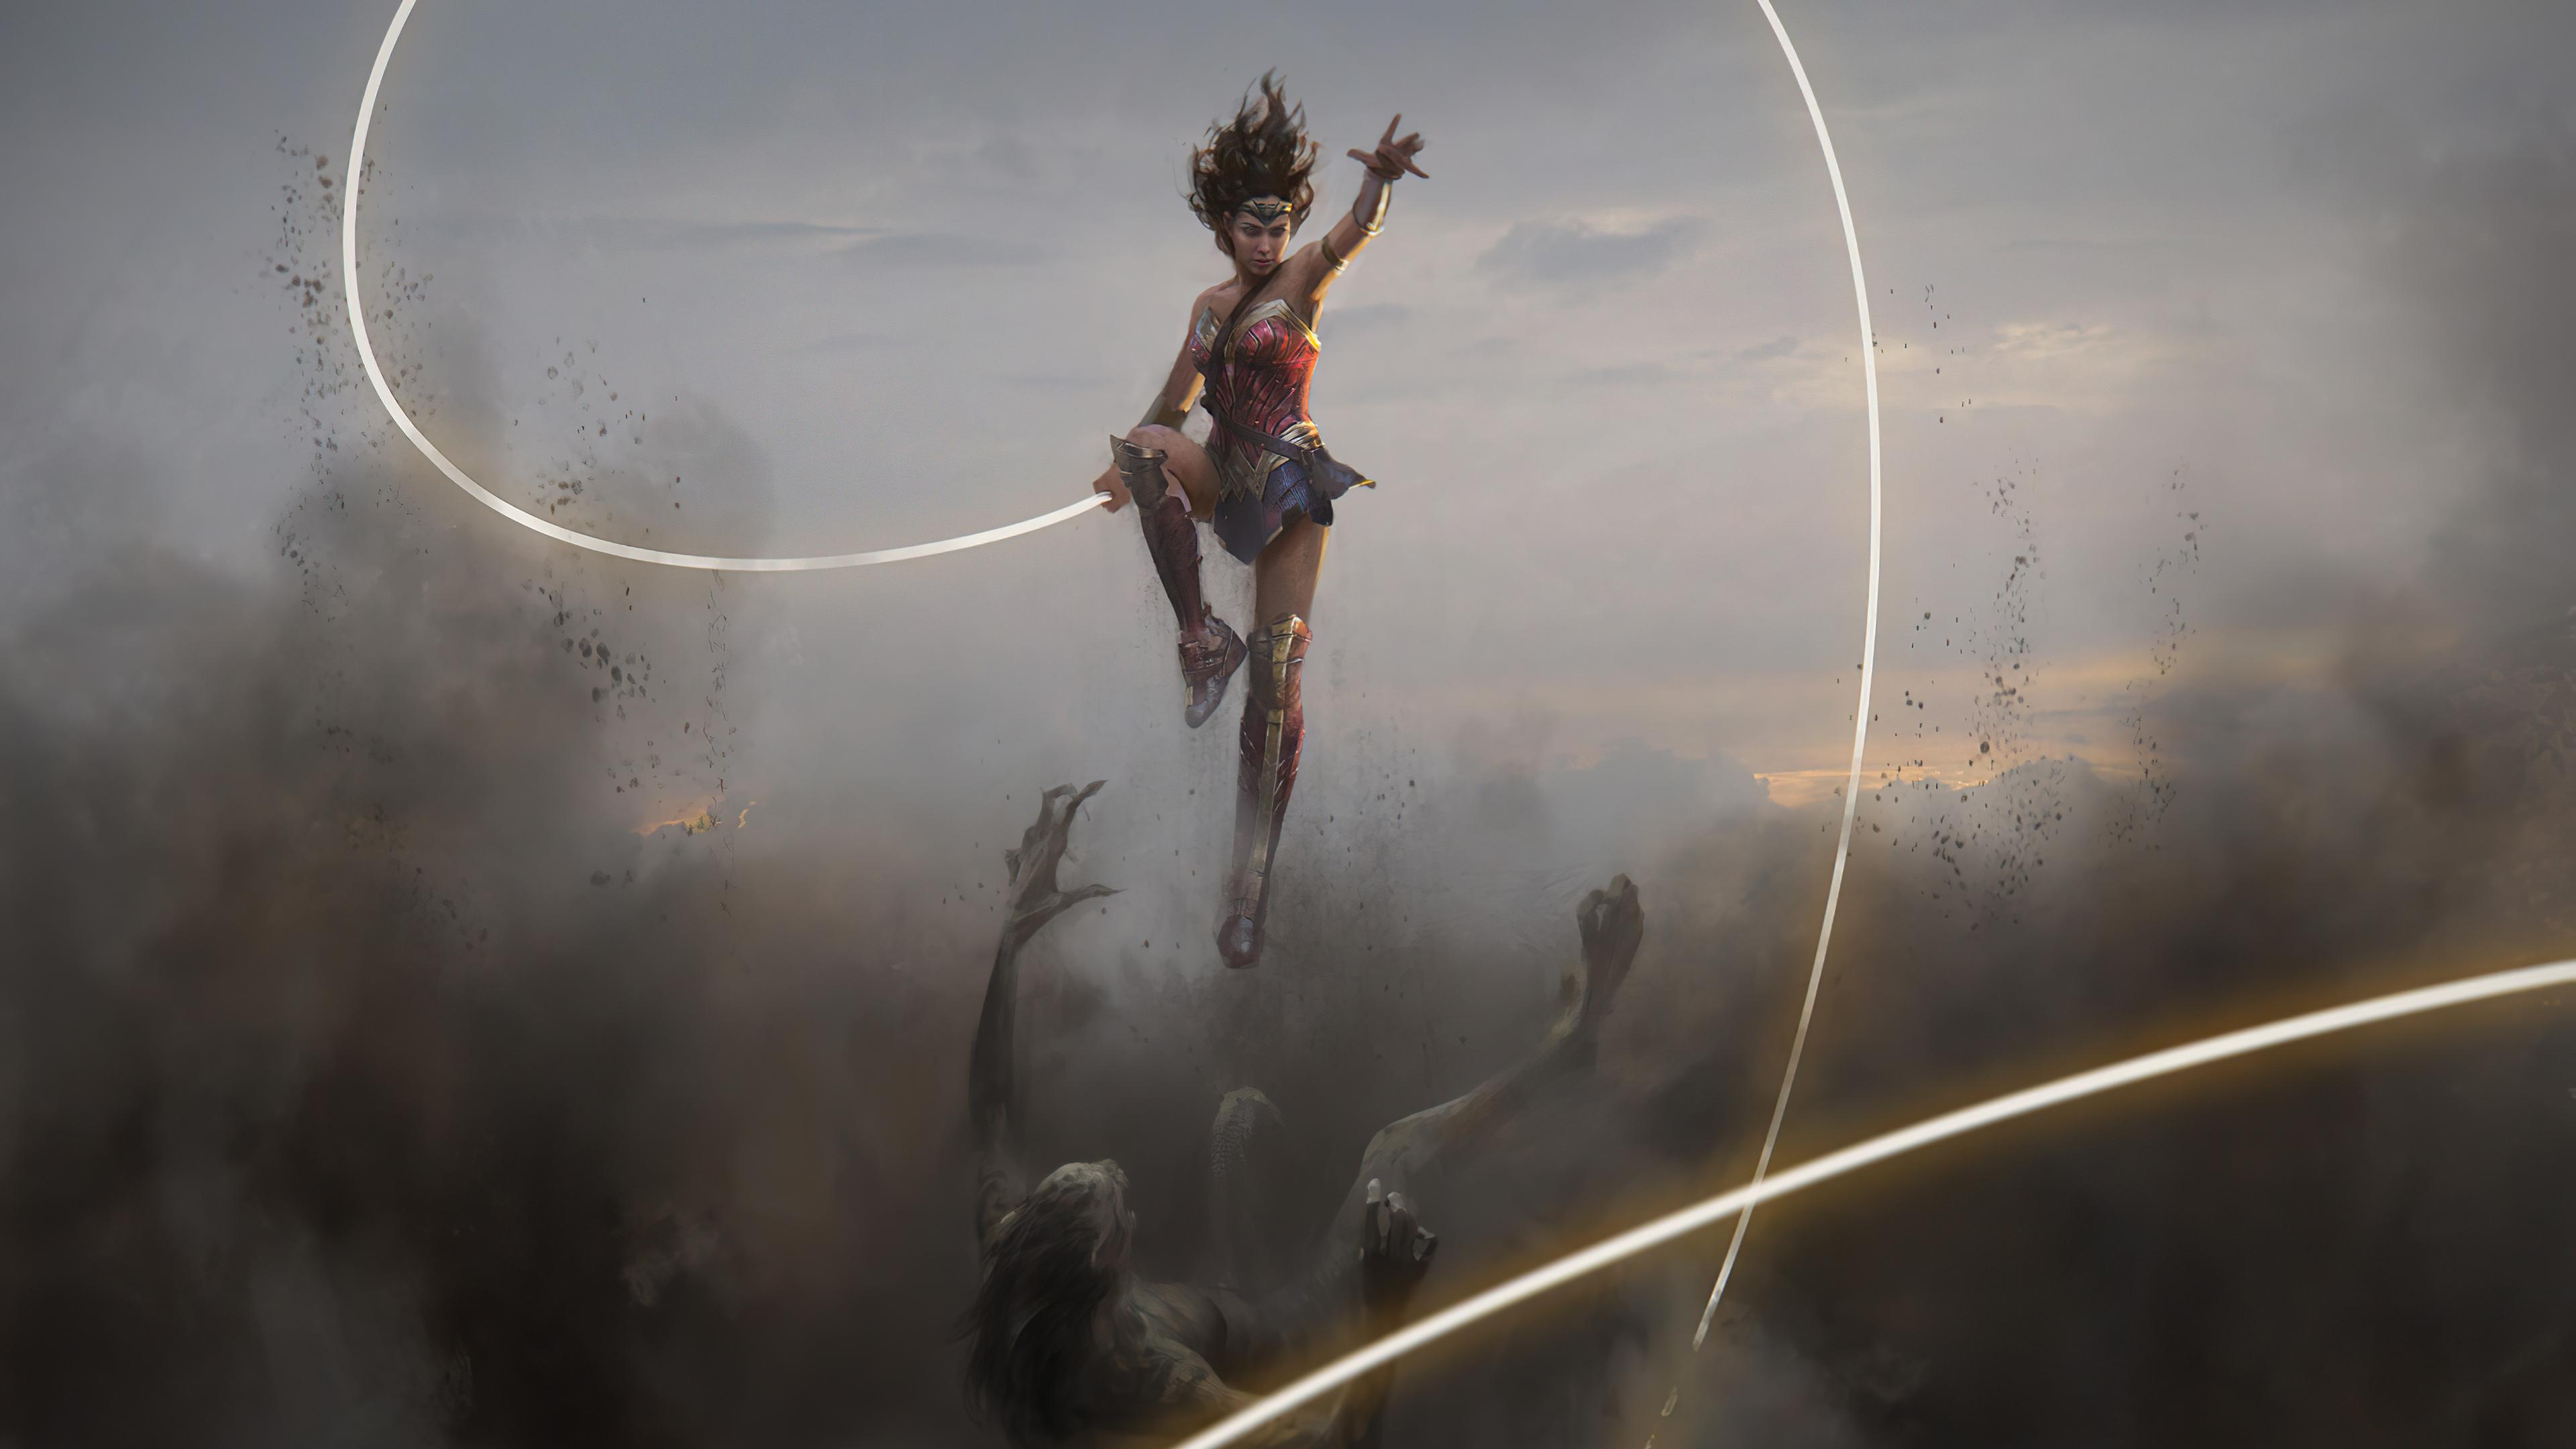 wonder woman 1984 early cheetah fight 4k 1618165516 - Wonder Woman 1984 Early Cheetah Fight 4k - Wonder Woman 1984 Early Cheetah Fight 4k wallpapers